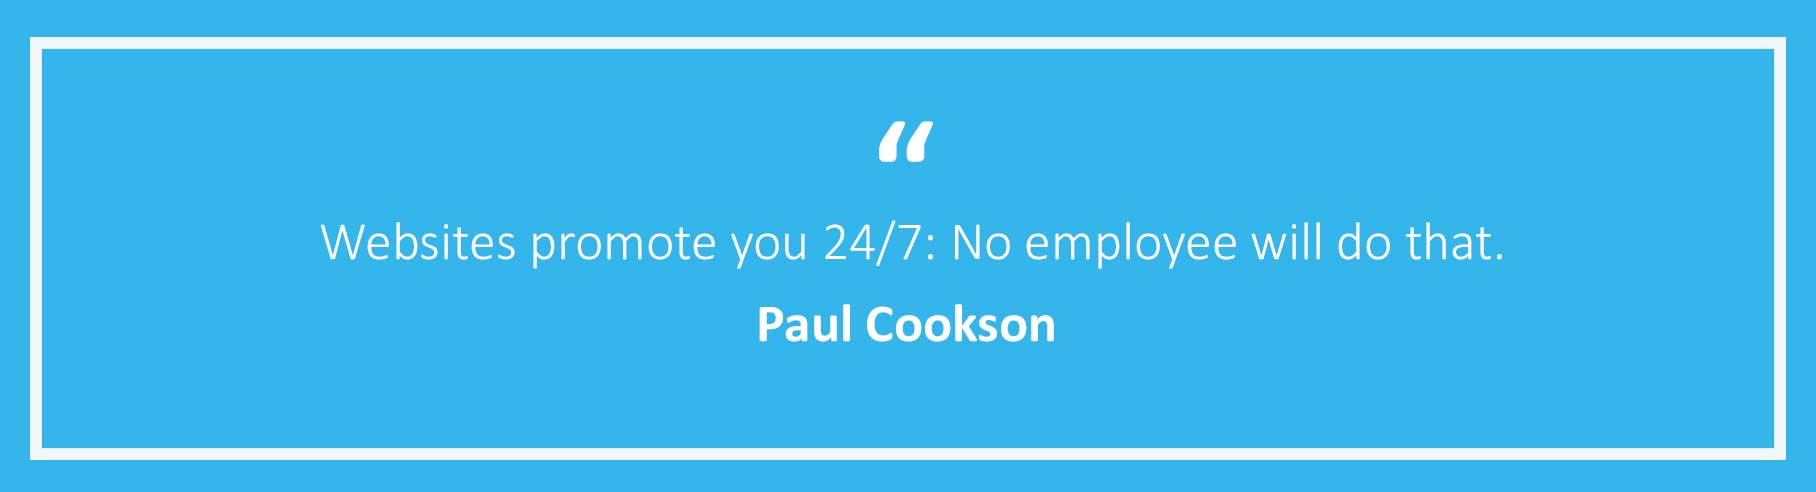 paul-cookson